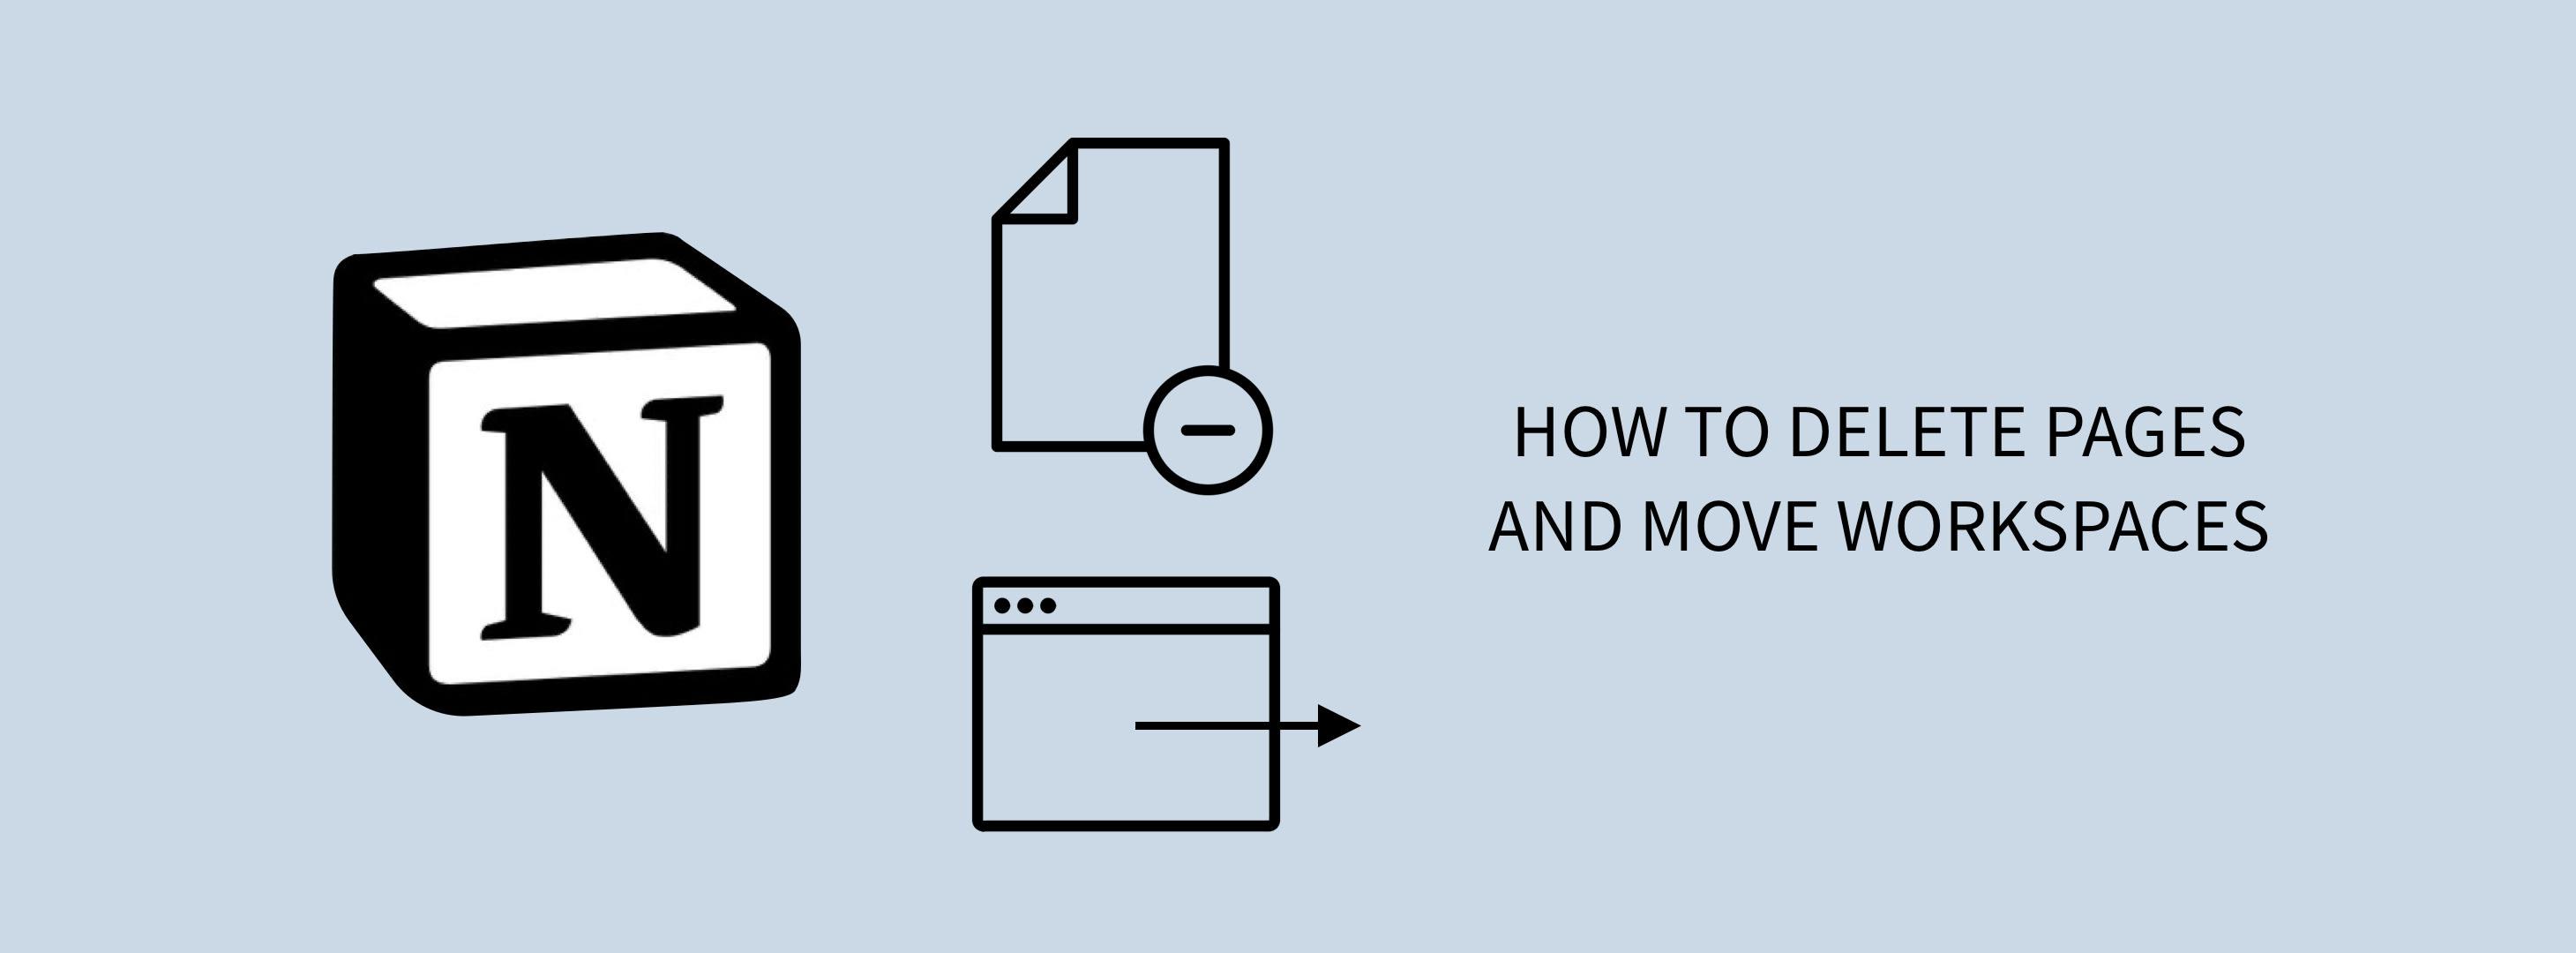 allapplenews-delete-pages-move-workspaces